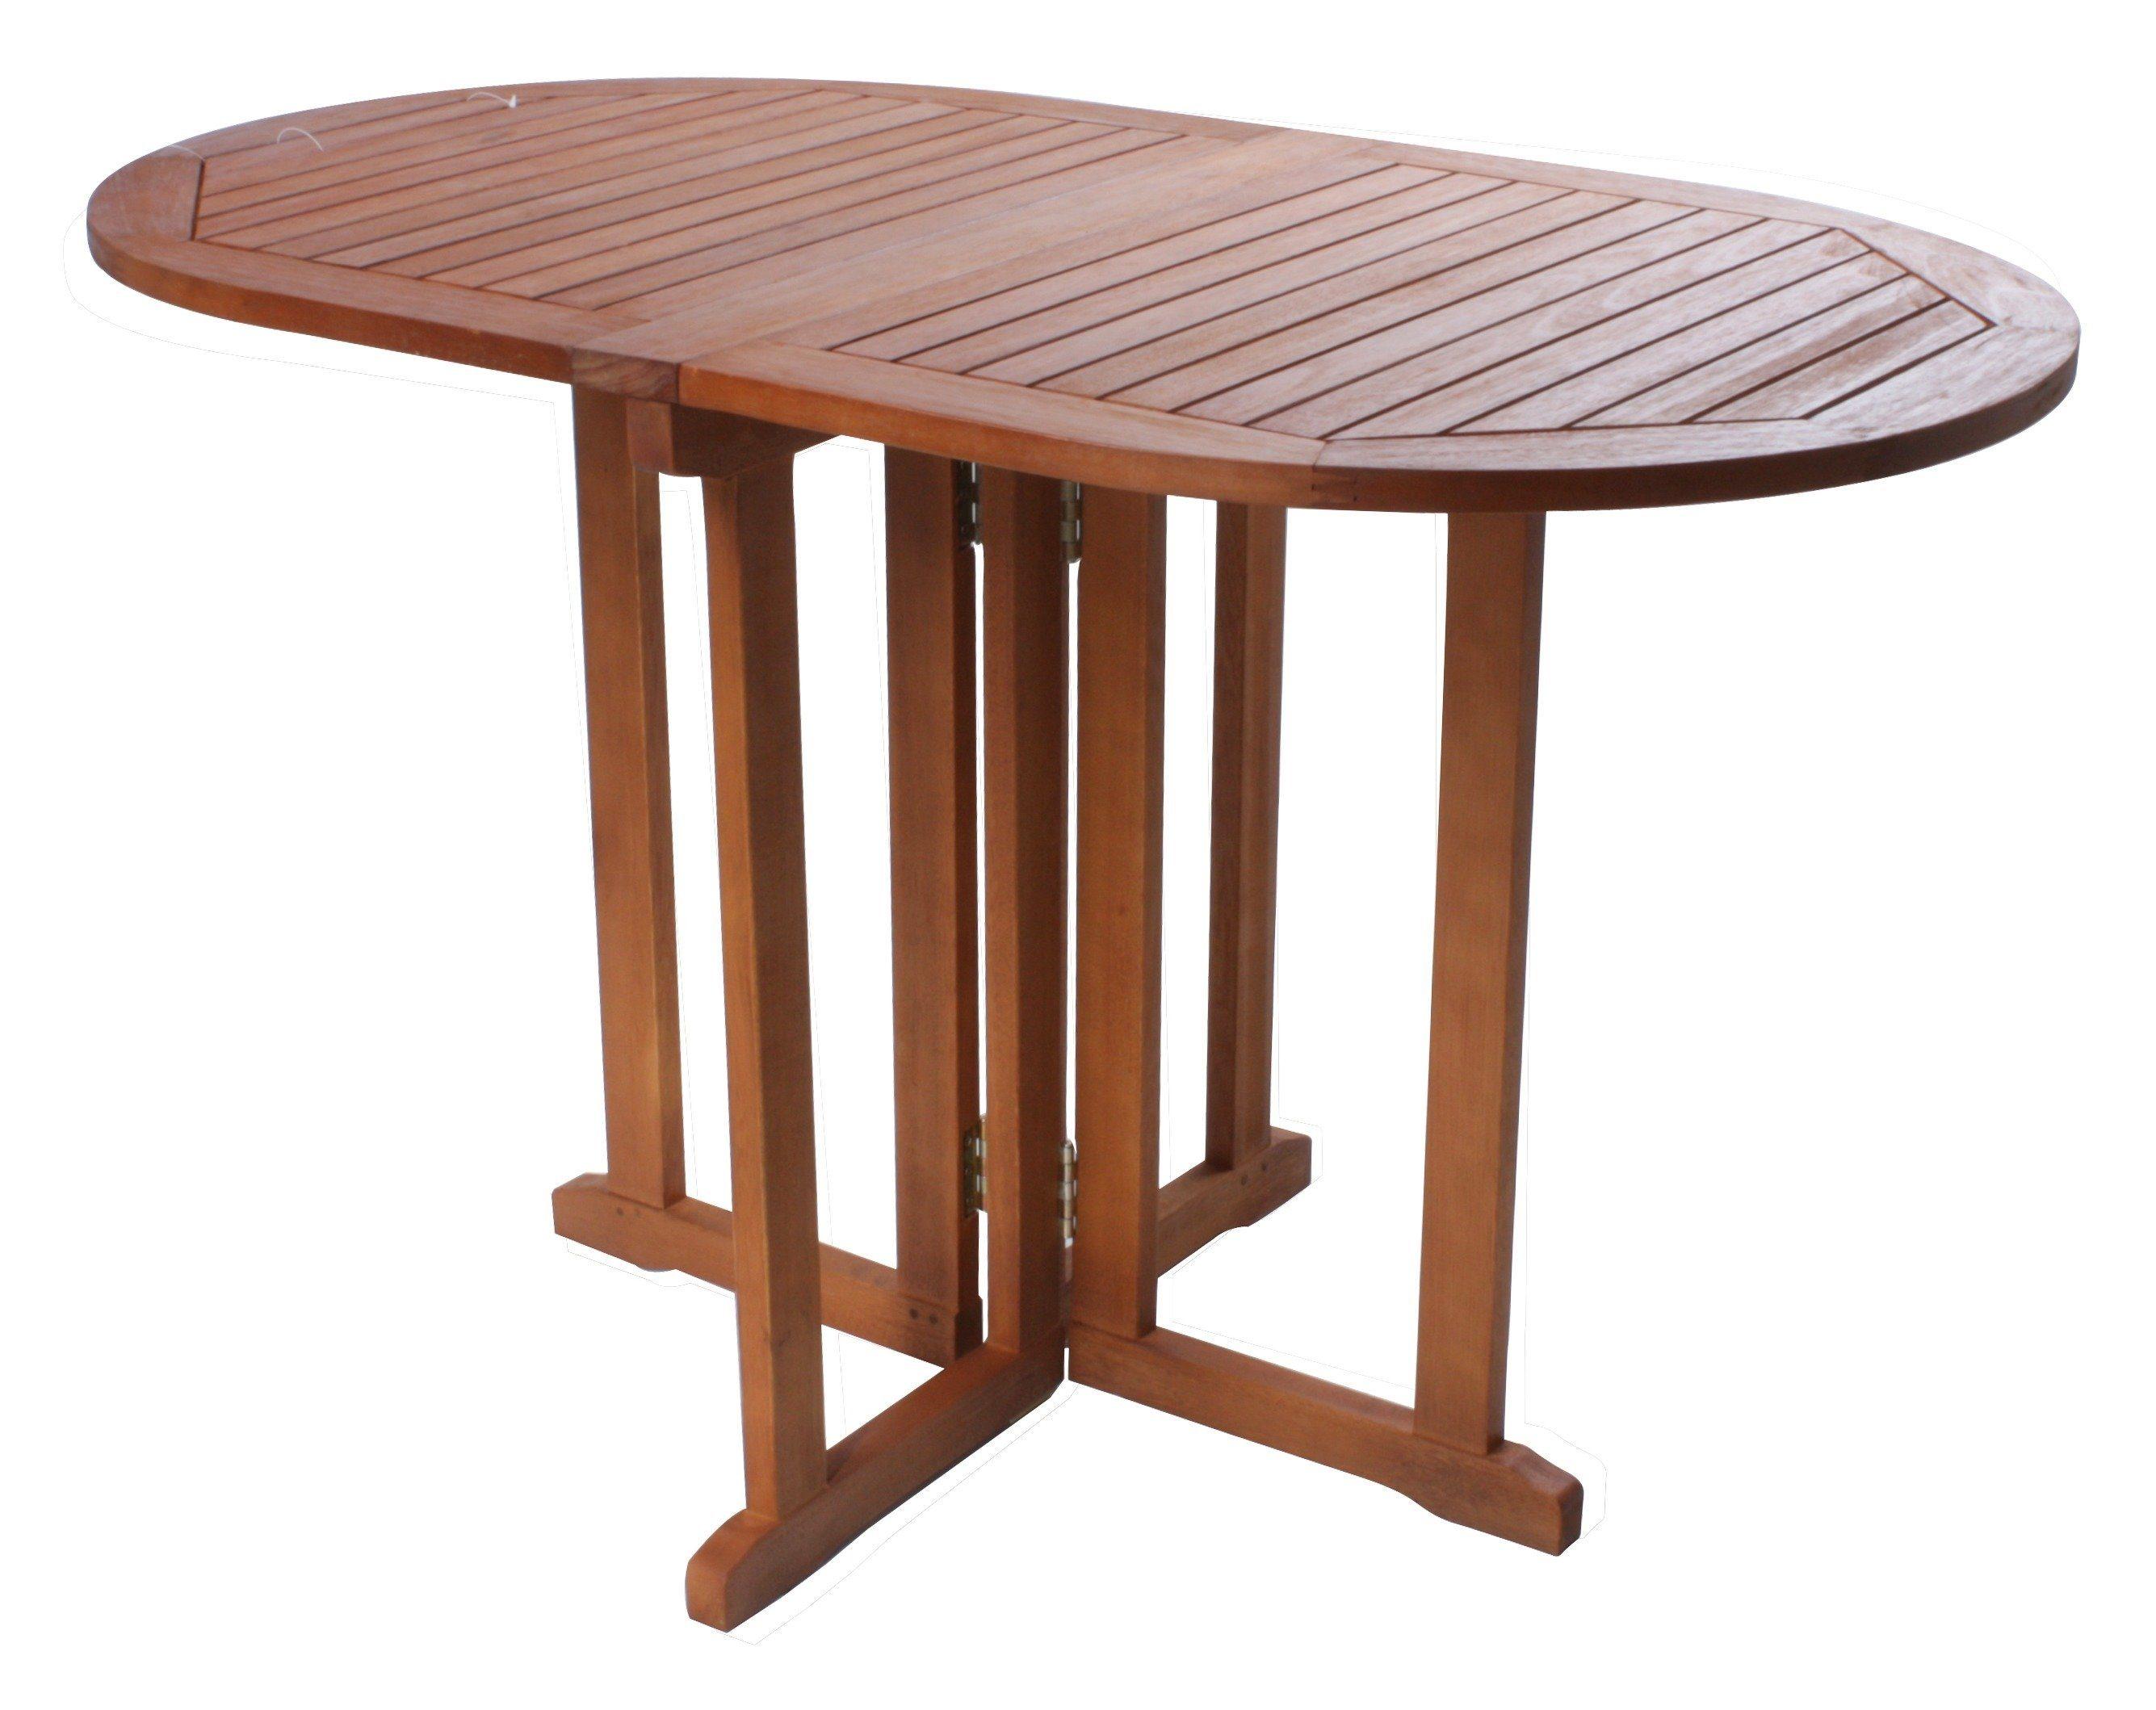 Gartentisch »Baltimore«, klappbar, Eukalyptusholz, 120x70 cm